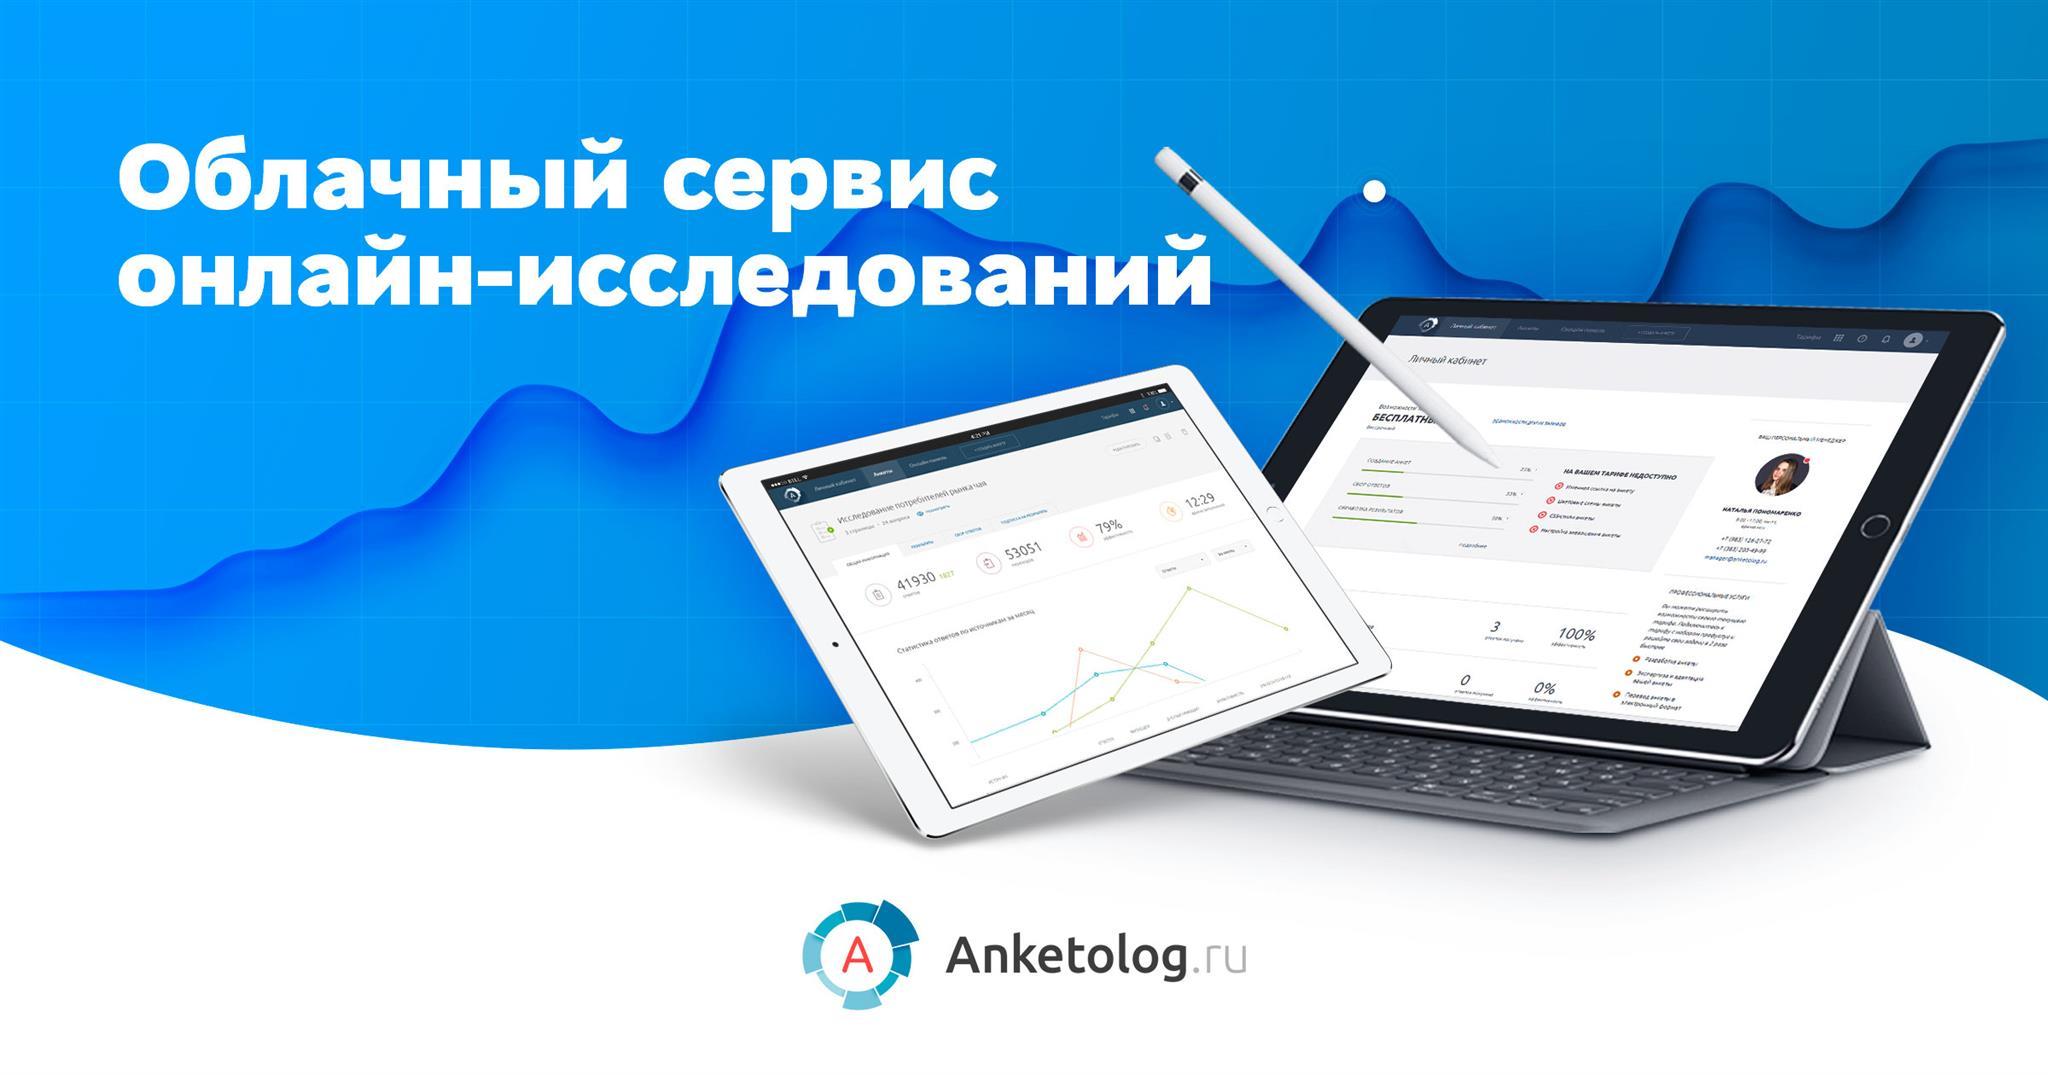 (c) Anketolog.ru